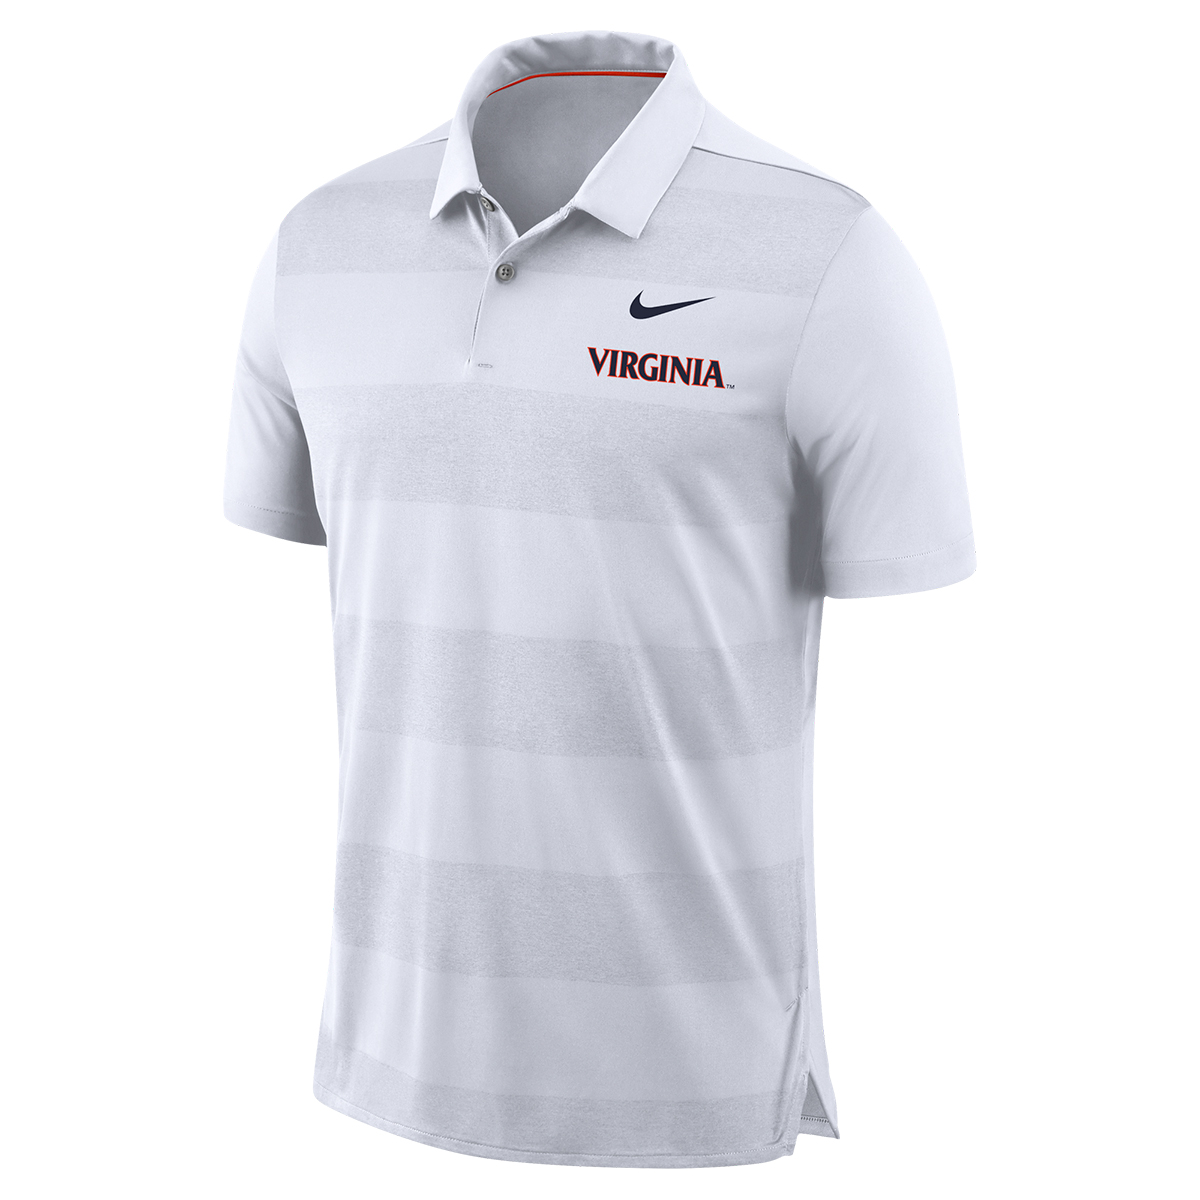 University of Virginia Nike Polo Shirt